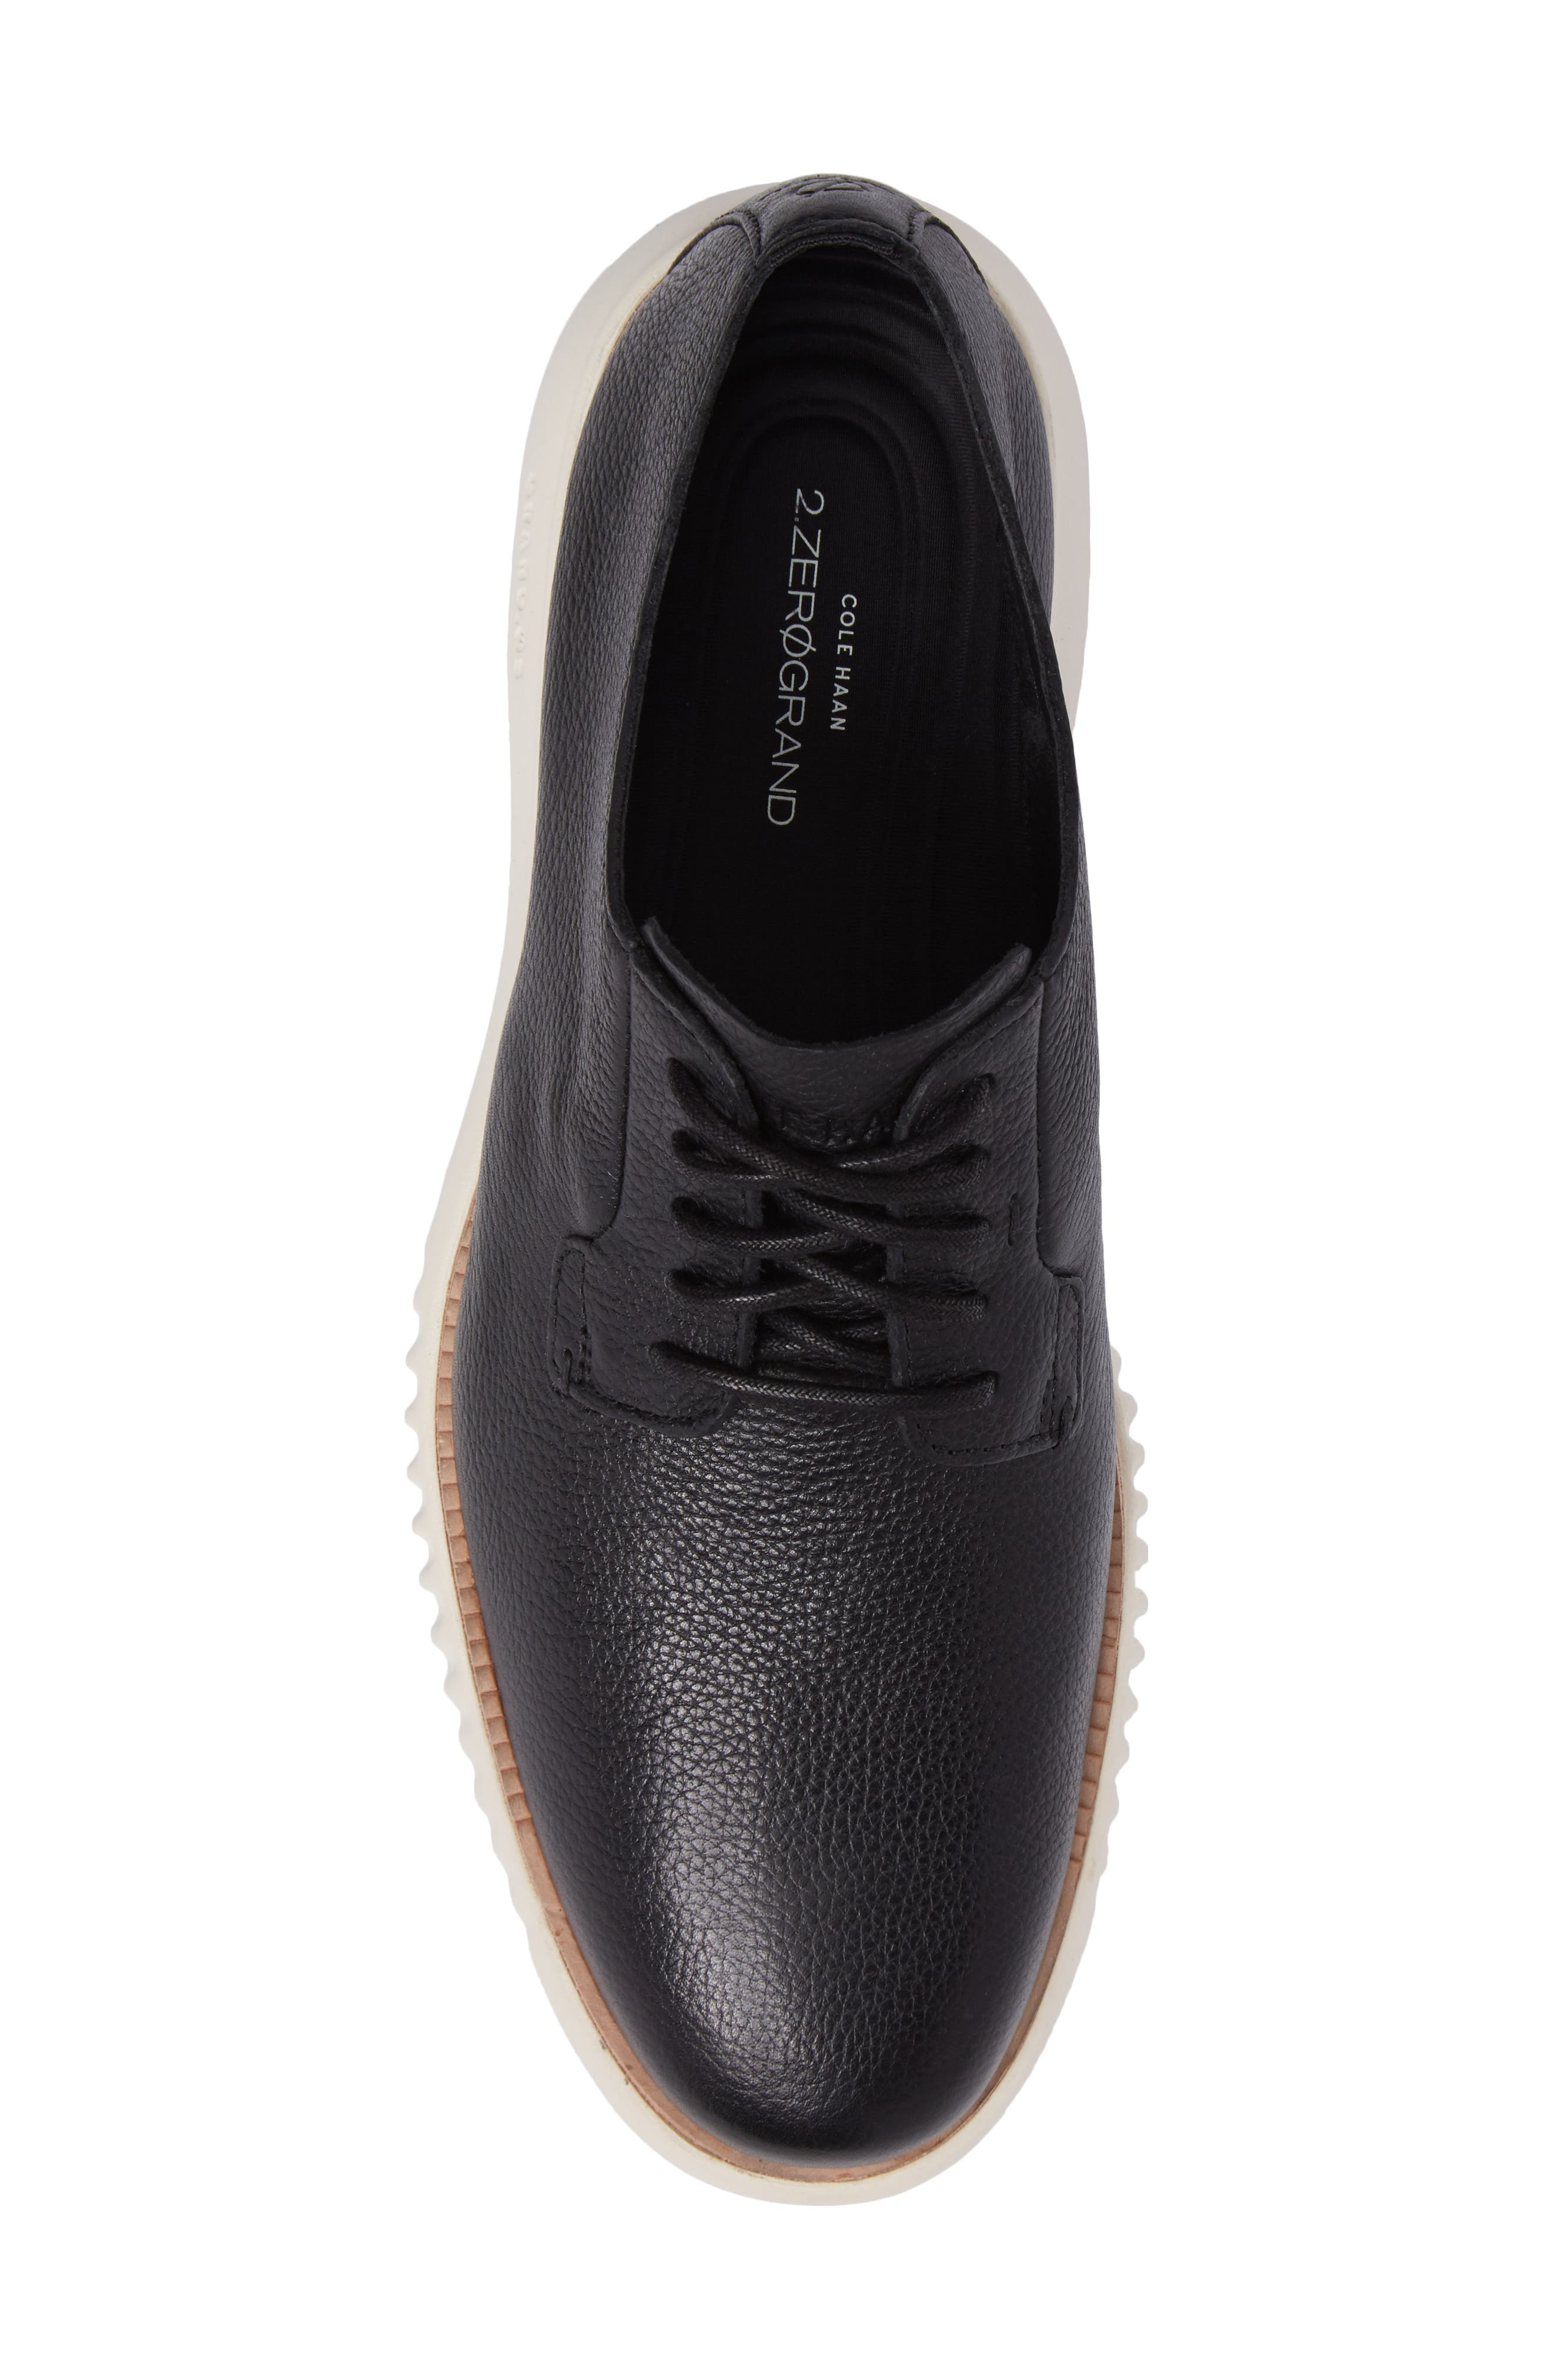 2.ZeroGrand Plain Toe Derby,                             Alternate thumbnail 5, color,                             Black/ Ivory Leather